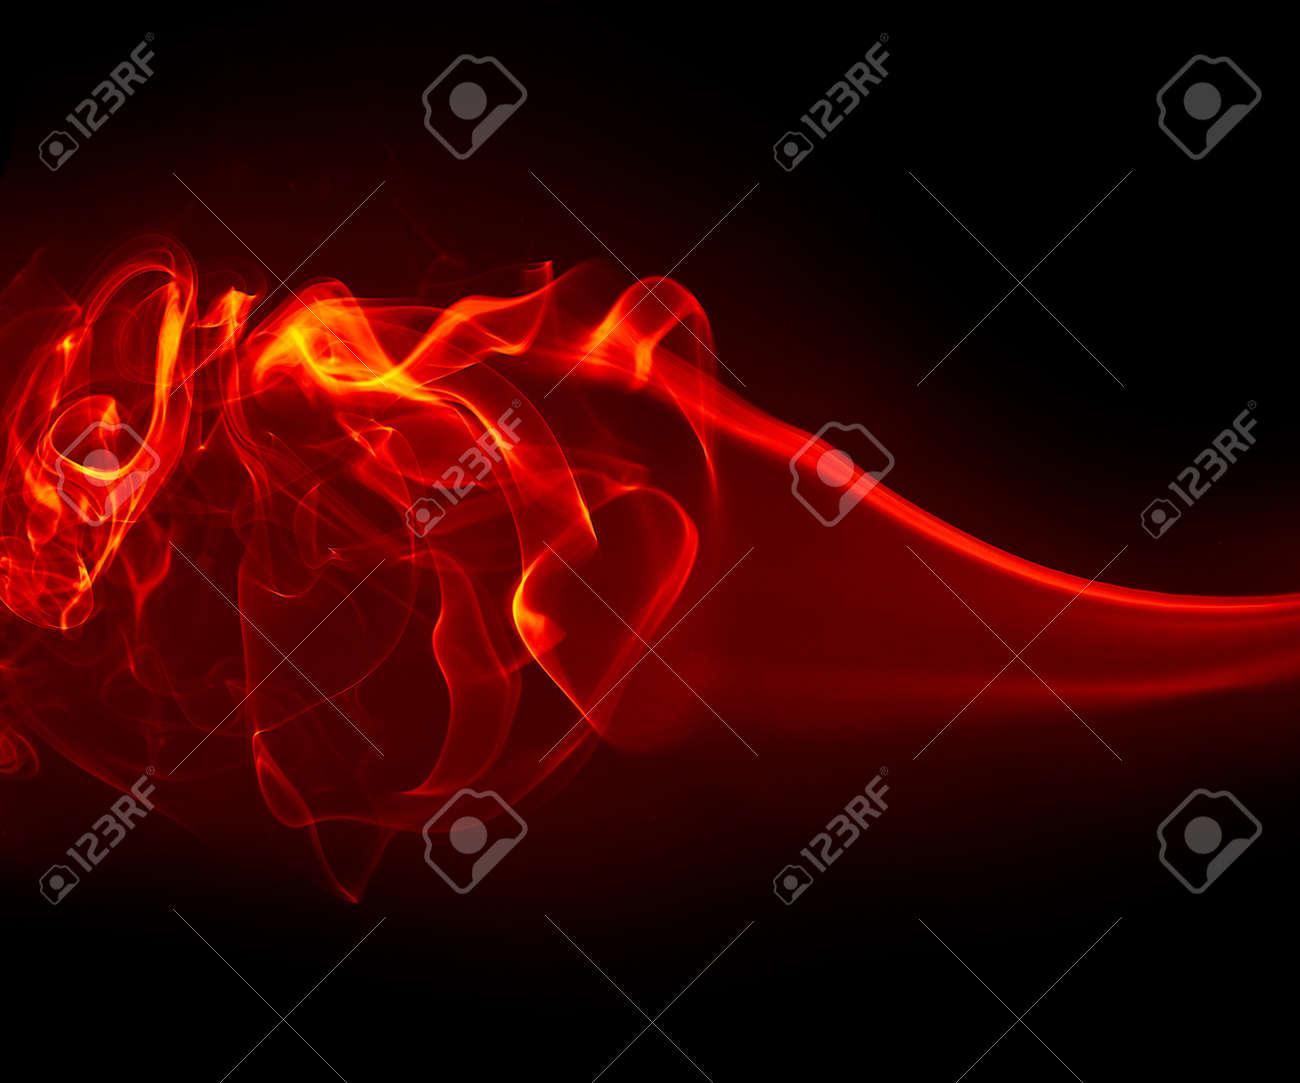 Abstract smoke isolated on black Stock Photo - 11838360